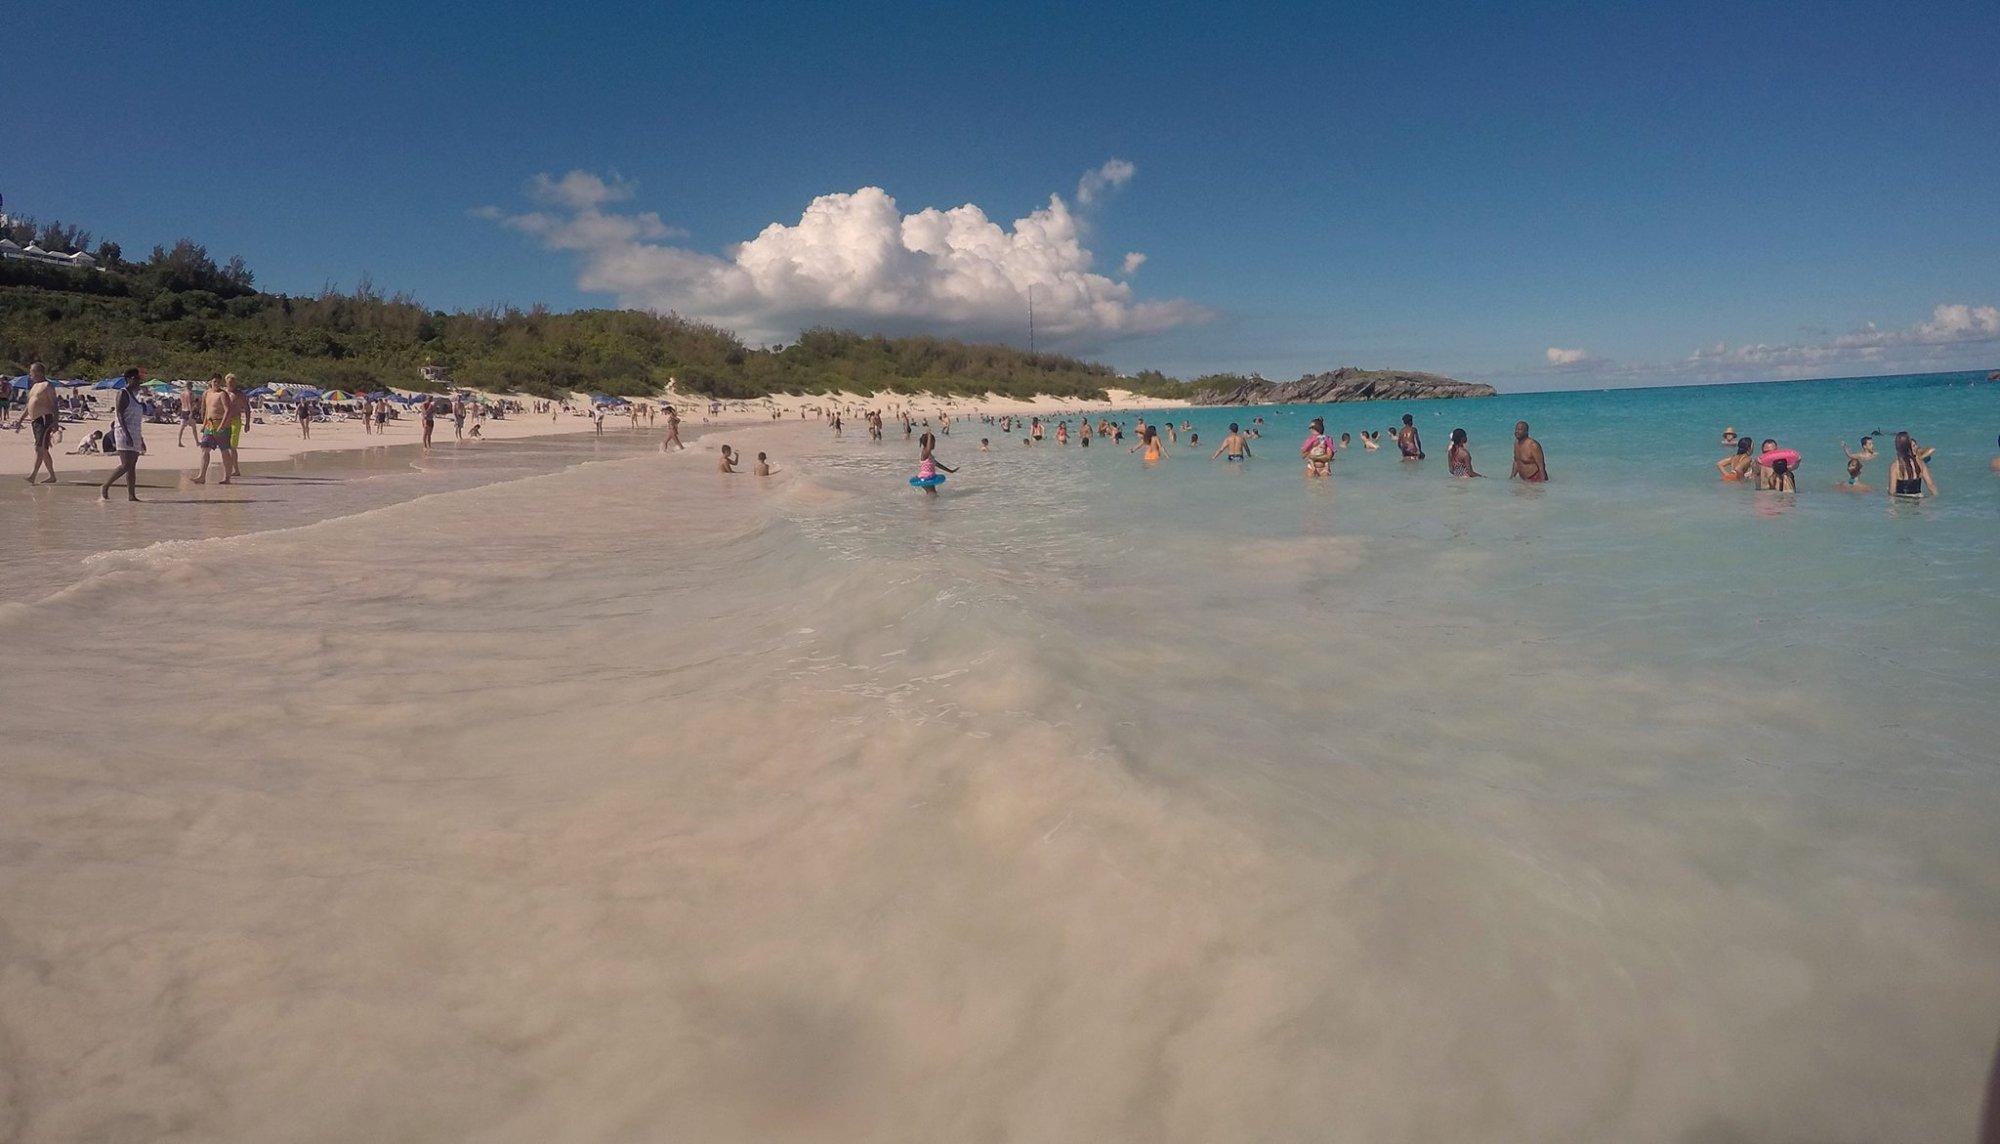 Pink Sand Beach (Horseshoe Bay Beach - Bermuda